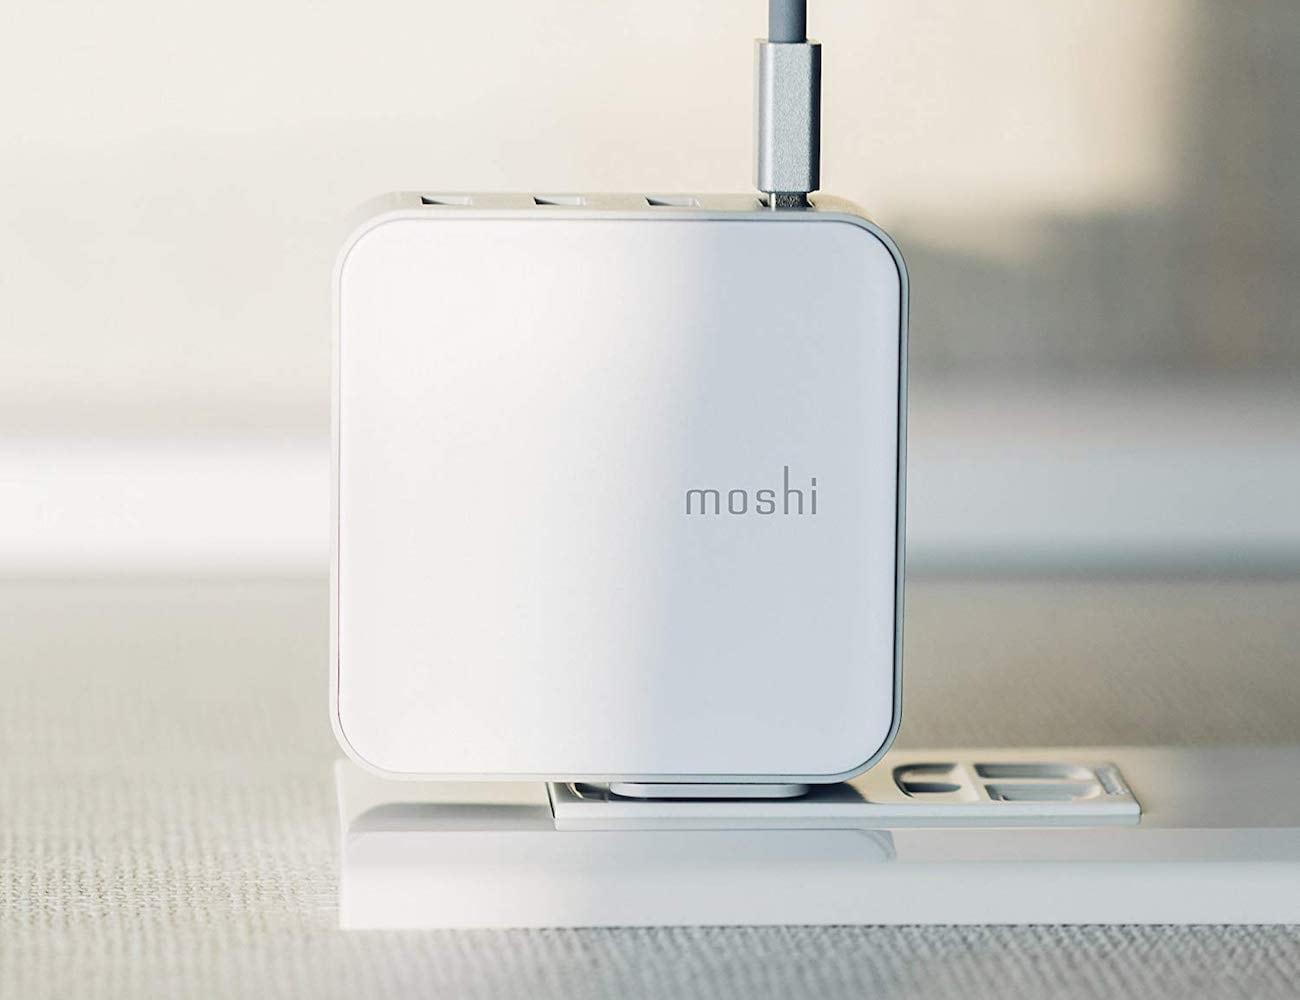 Moshi ProGeo 4-Port USB Wall Charger